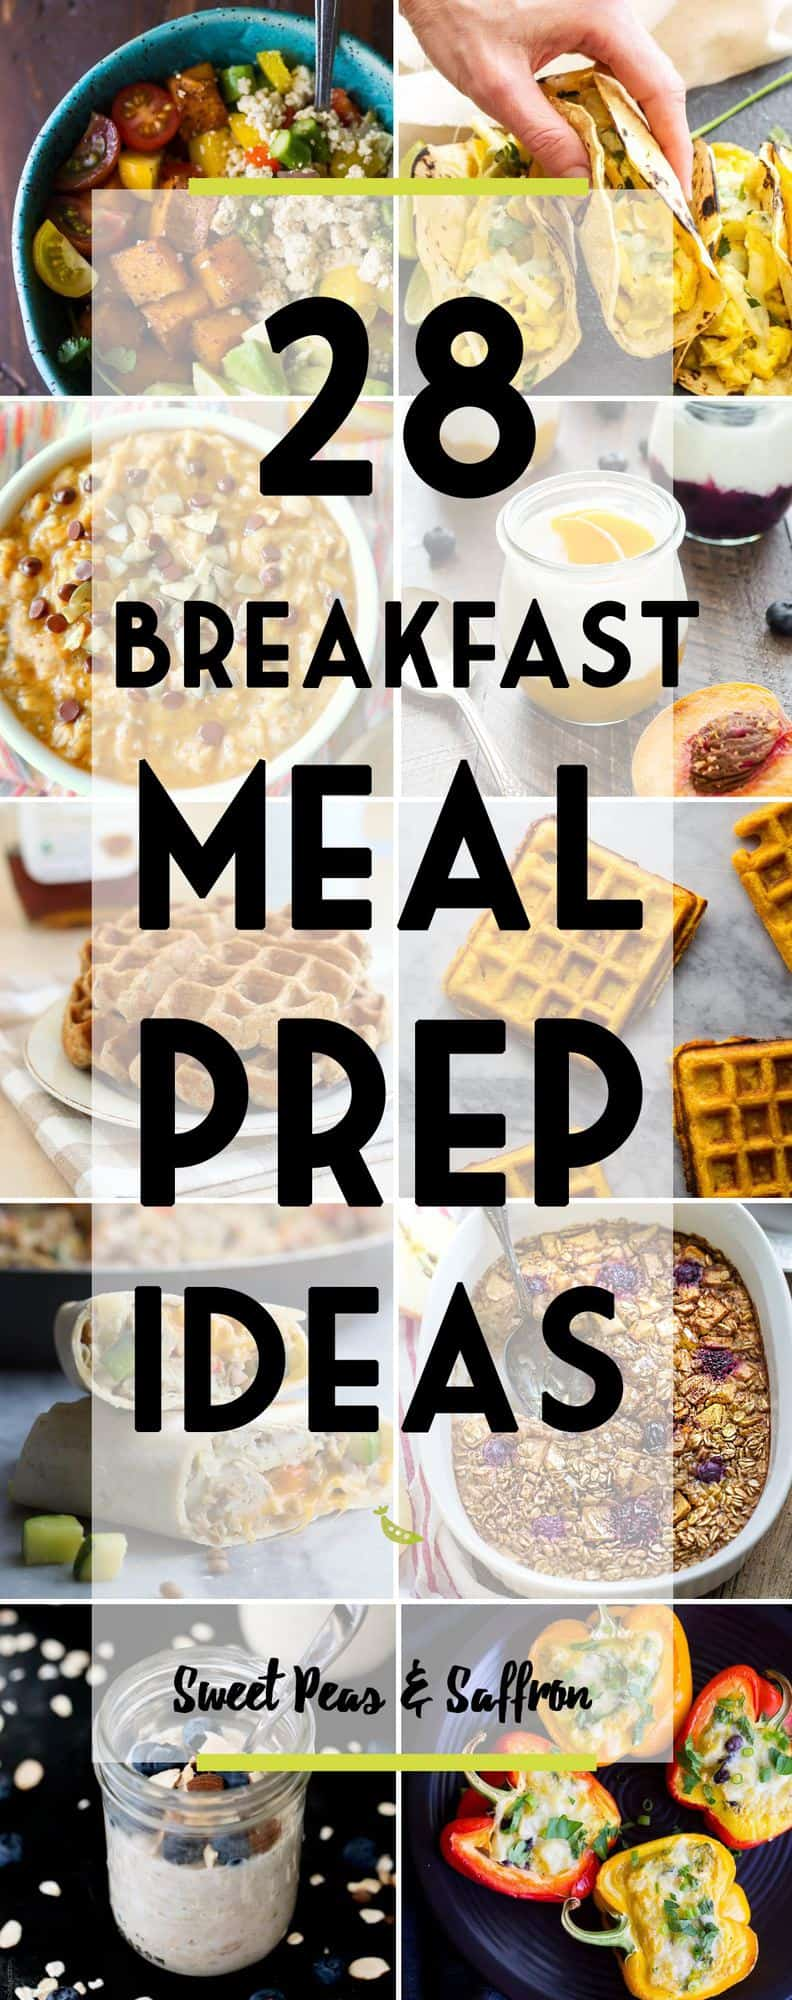 28 Healthy Breakfast Meal Prep Ideas: egg-based, oatmeal, waffles, pancakes, vegan and more!